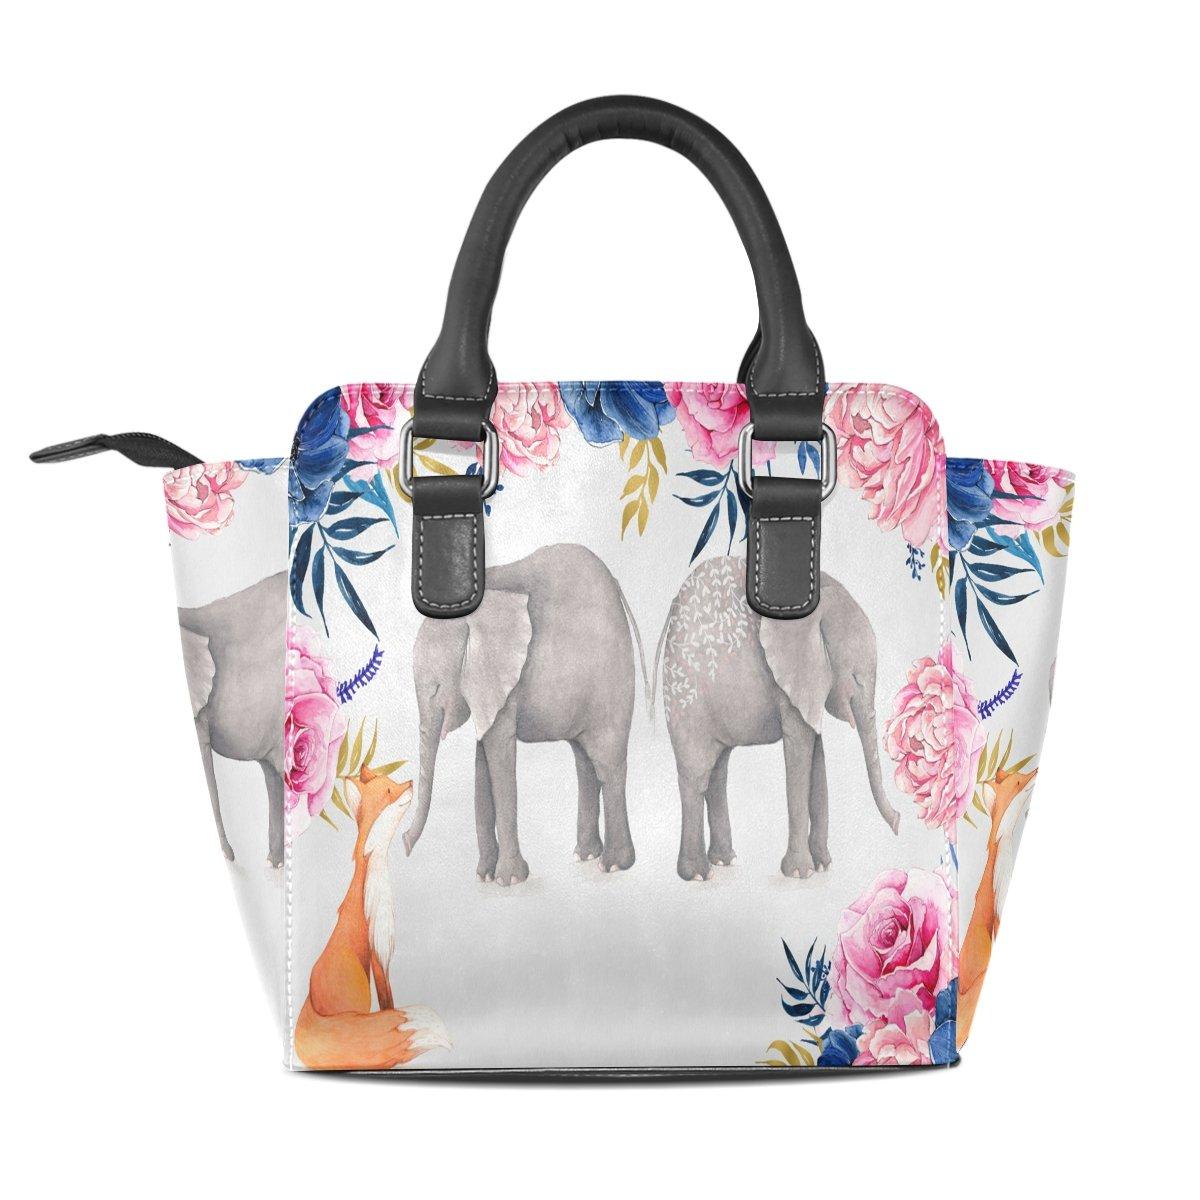 imobaby Elephants With Fox PU Leather Girls Top-Handle Handbags Single-Shoulder Ladies Tote Crossbody Bag Messenger Bags For Women